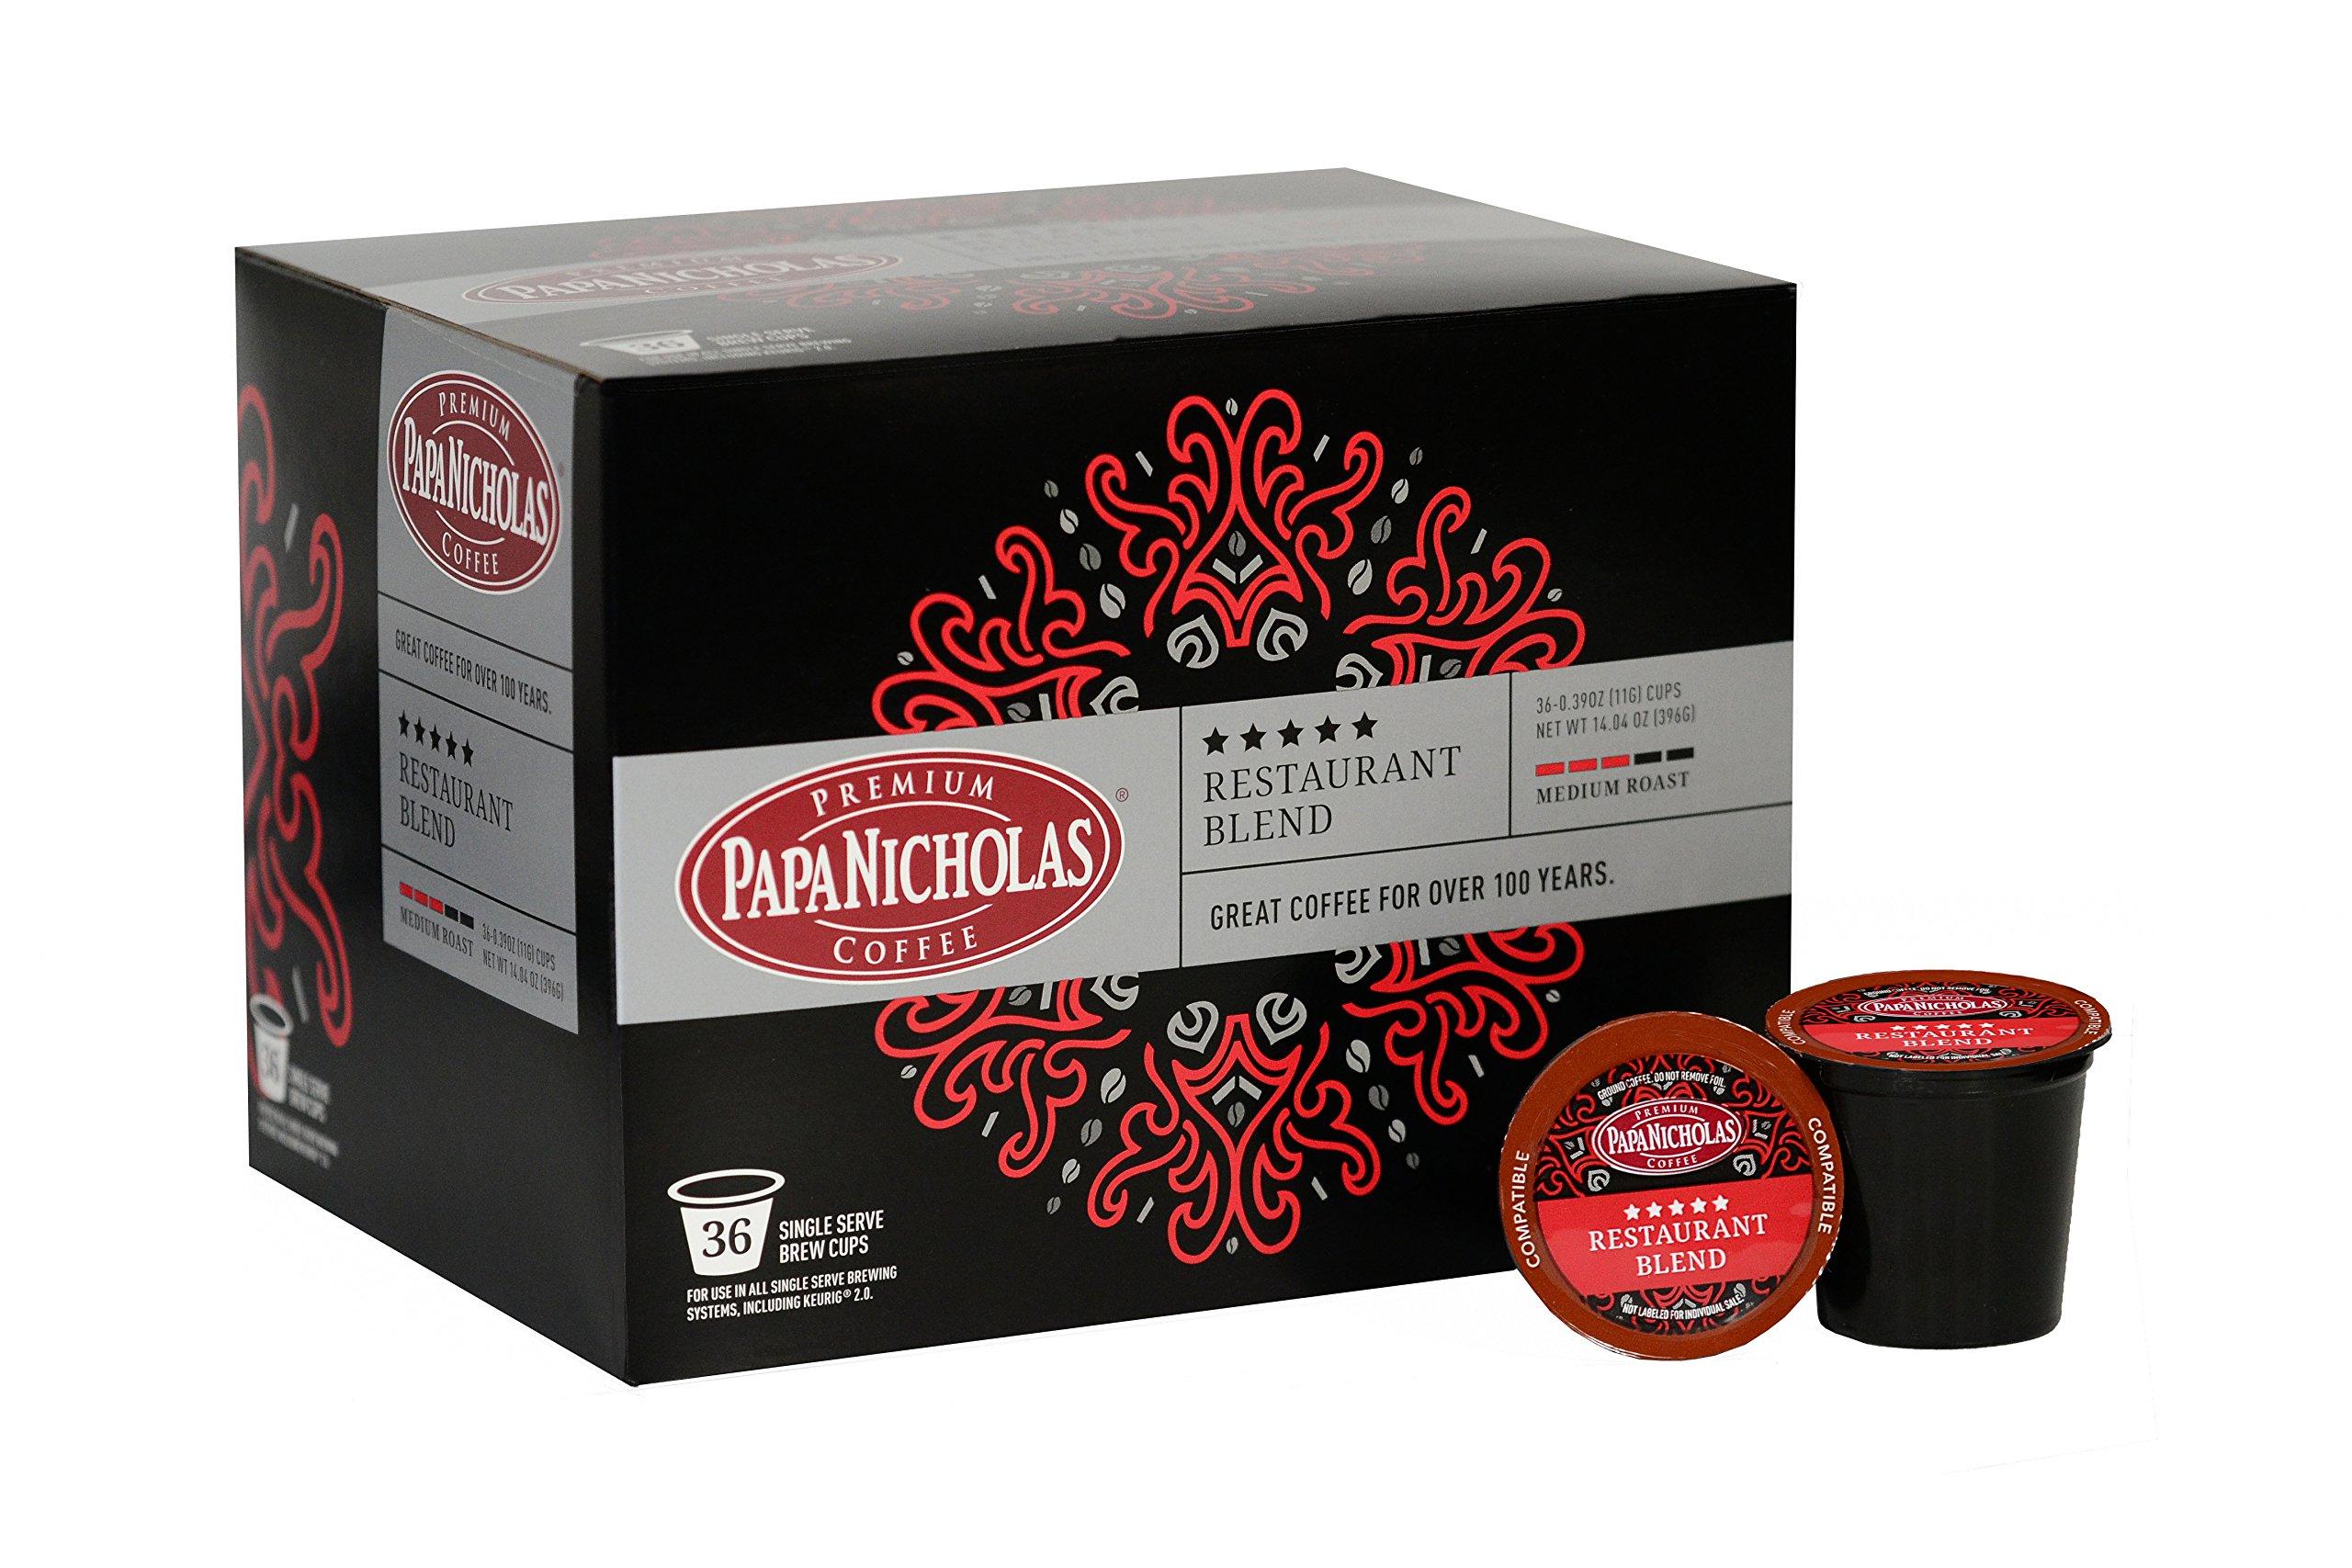 PapaNicholas 5-Star Restaurant Blend Single Serve Coffee Cups, Fits Keurig K Cup Brewers, Box of 36 (03365)